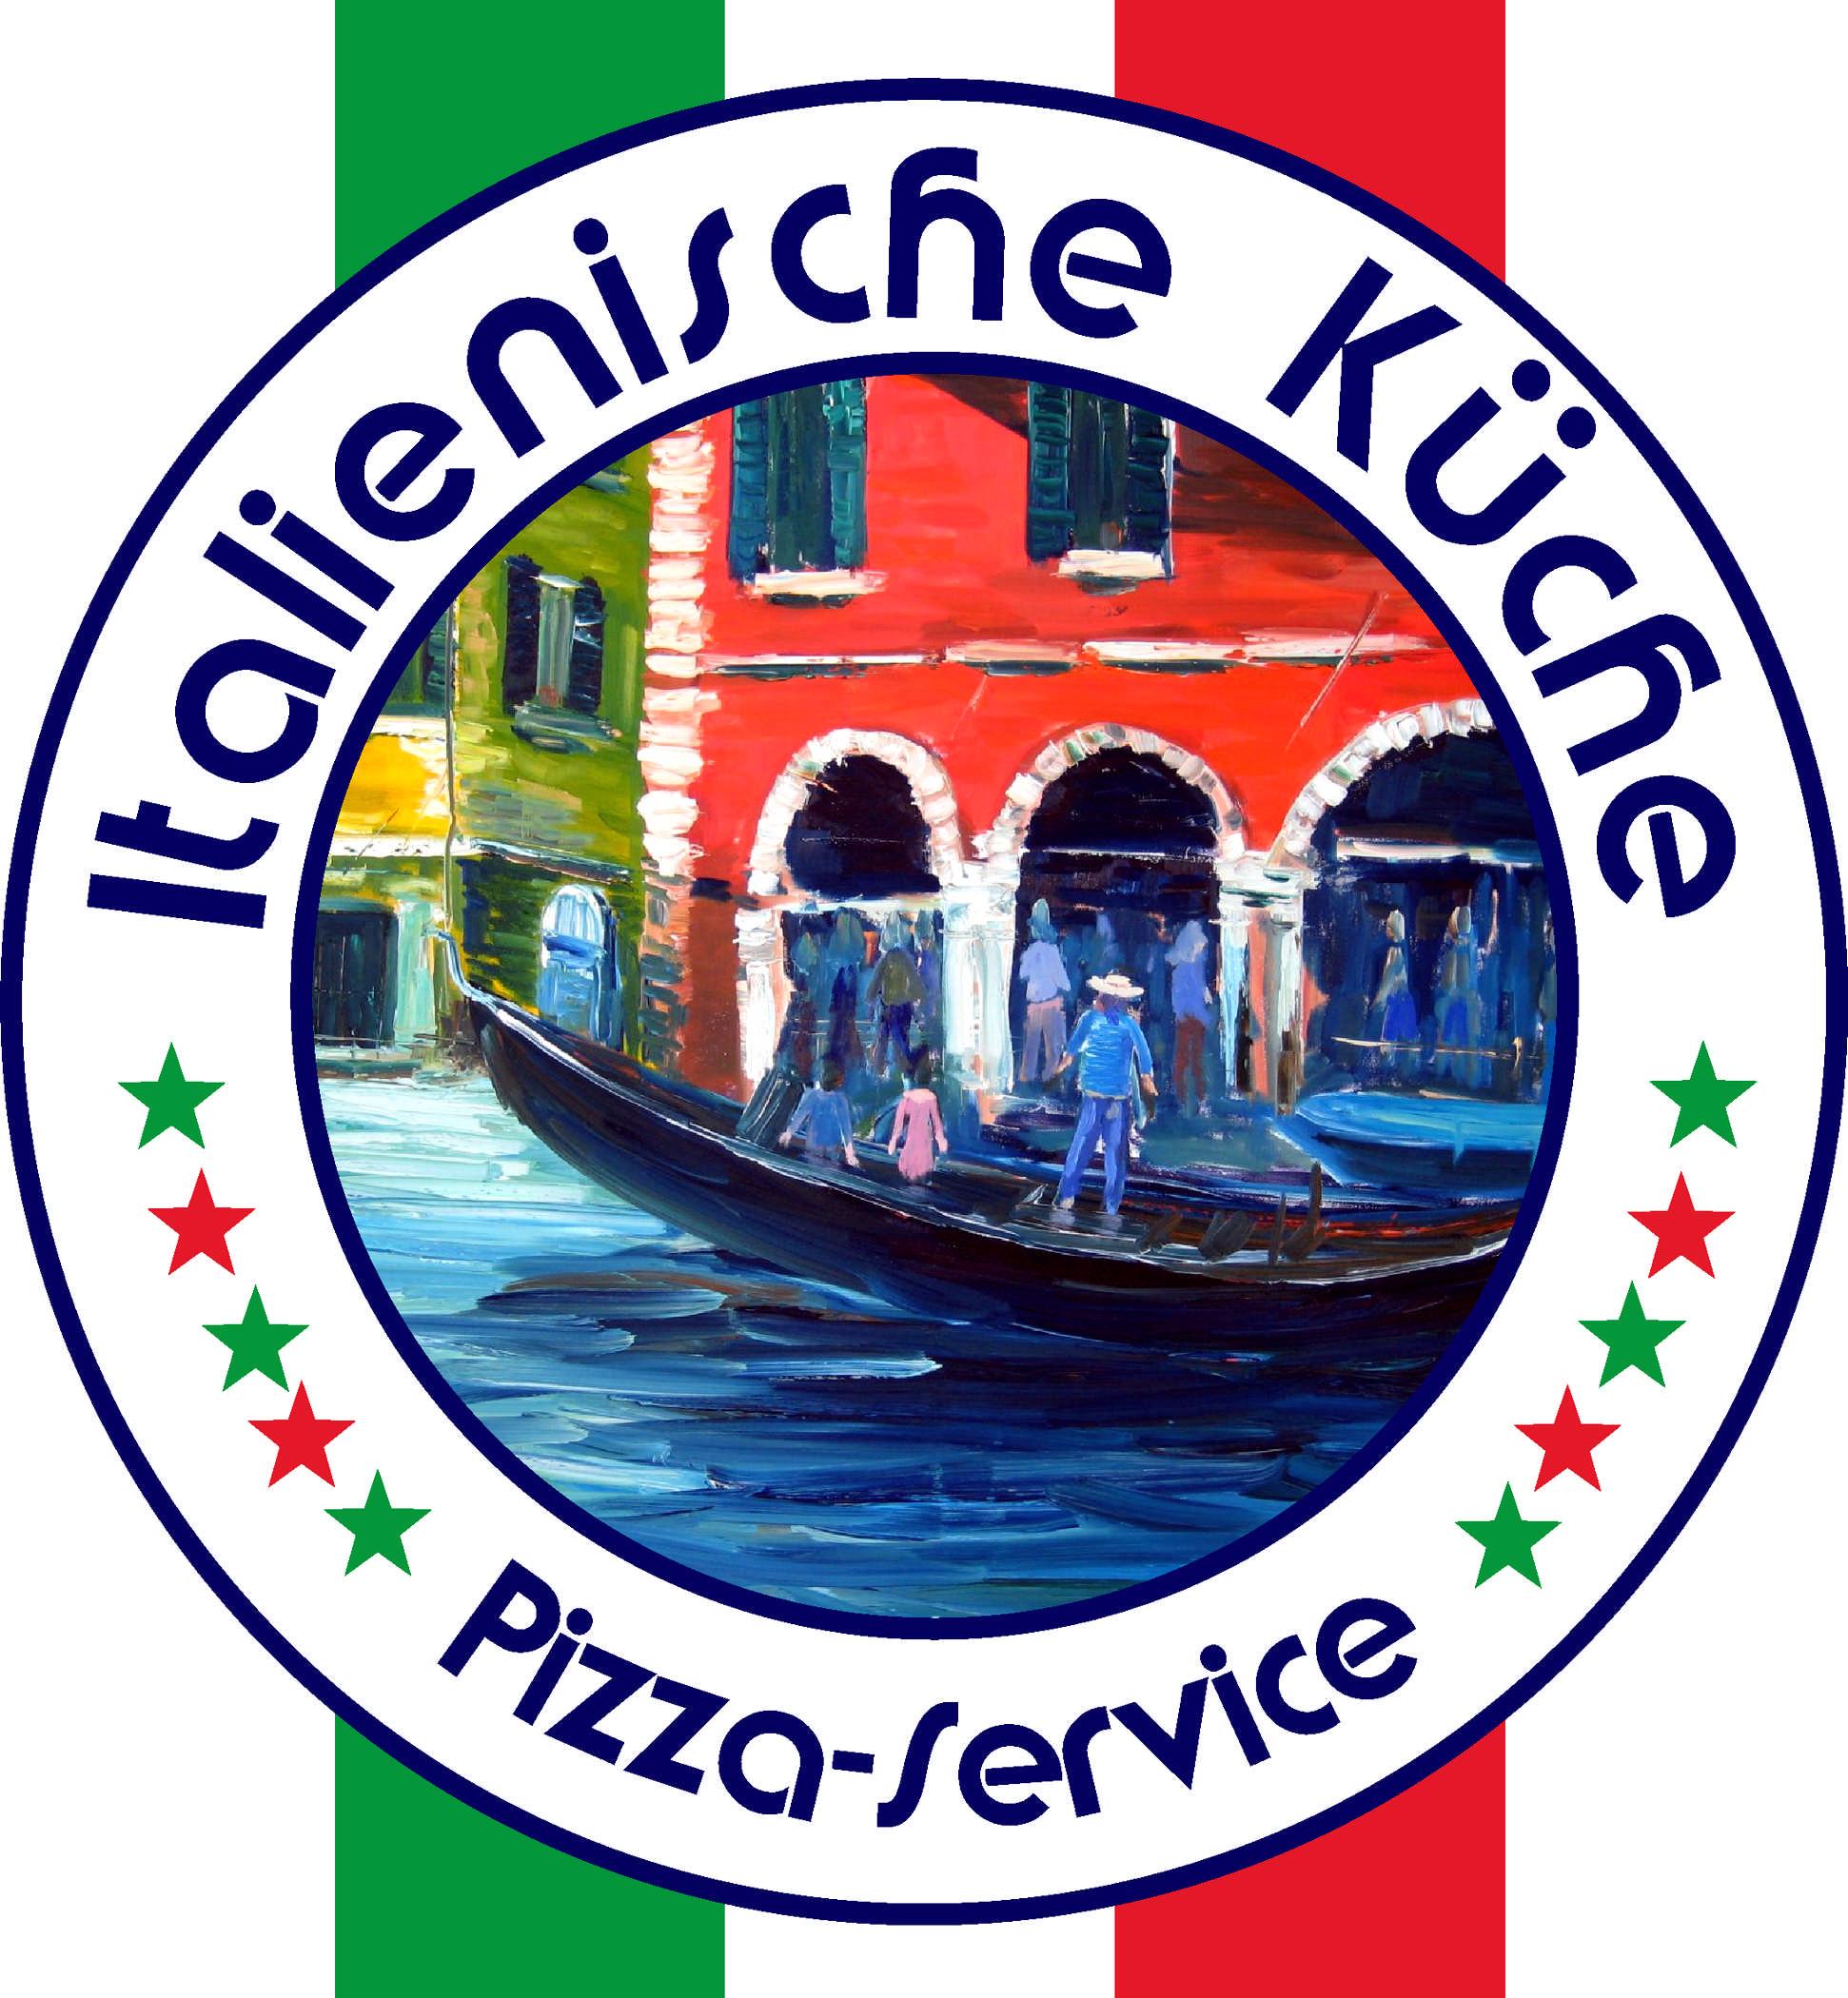 Logo Italienische Kueche Pizza Service Manet Venezia Painting - Oil ...